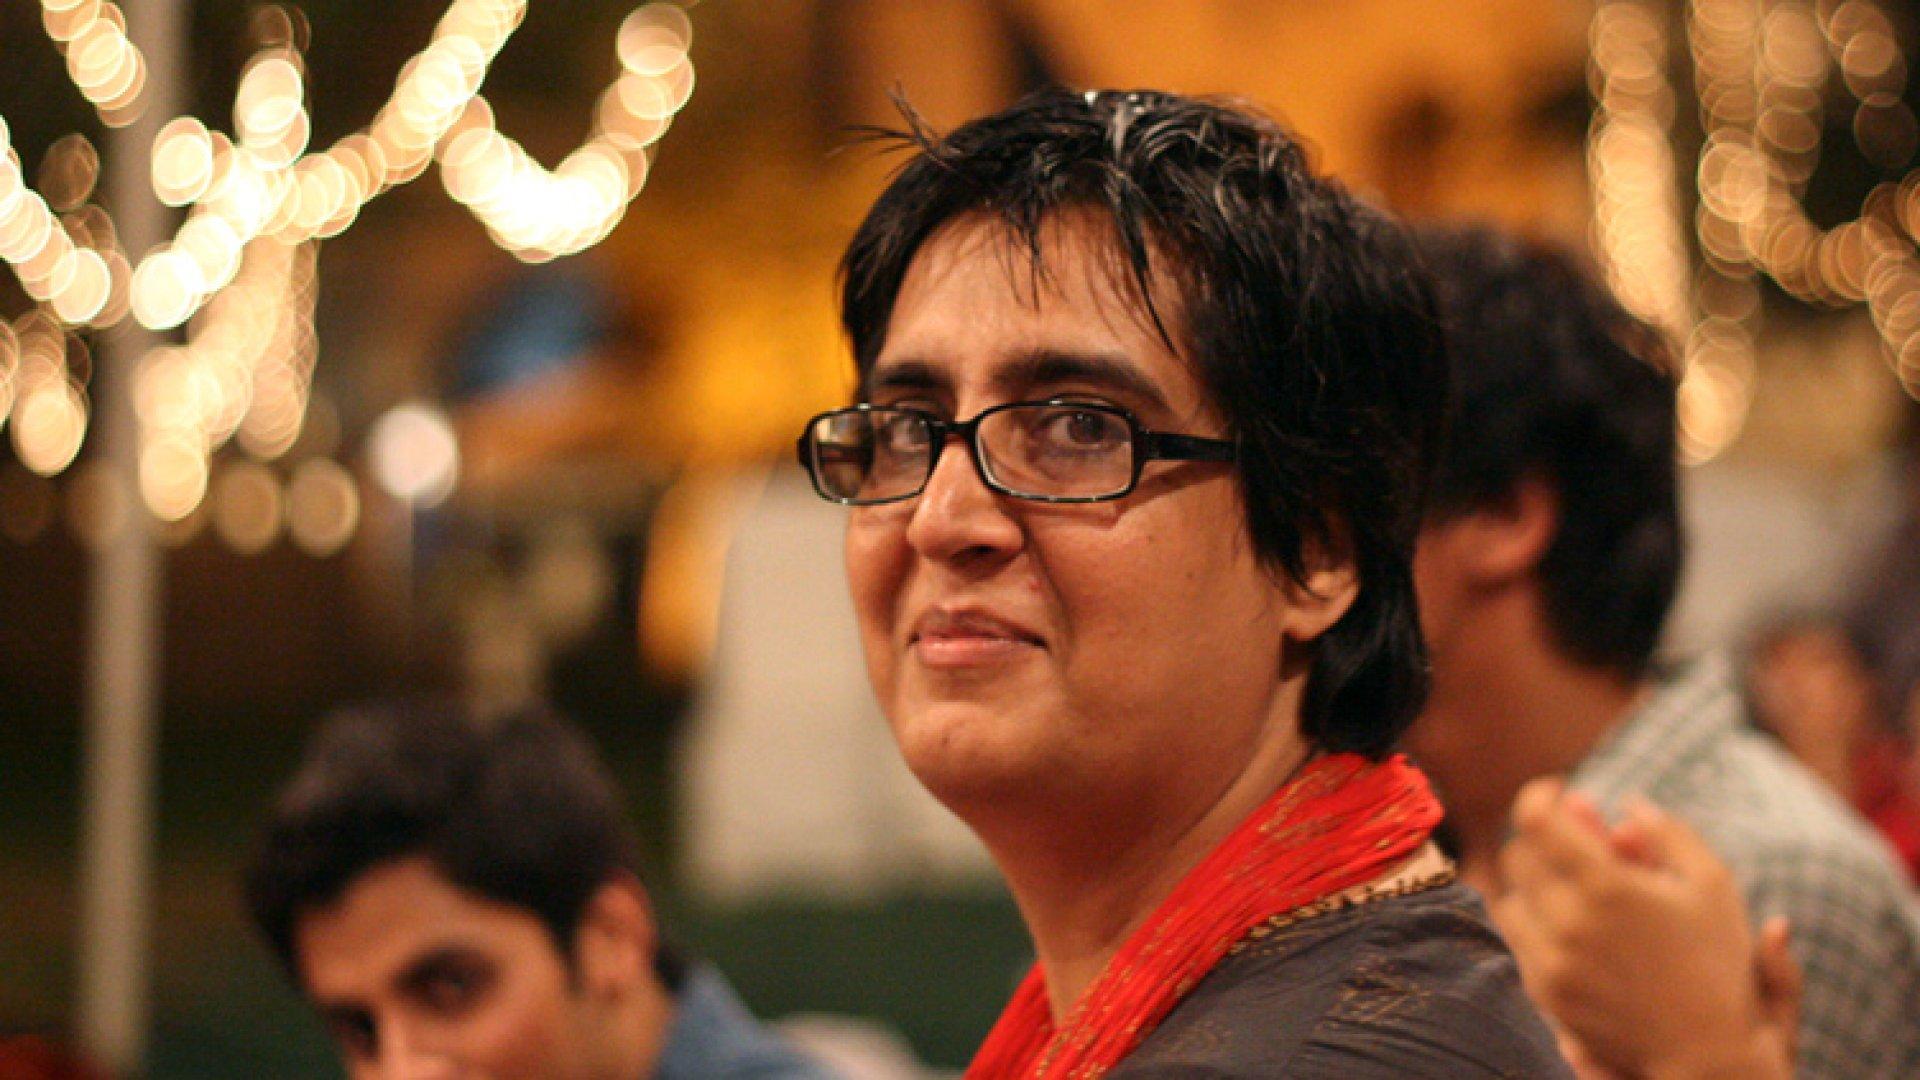 Tech Guru Sabeen Mahmud: 'Fear Is Just a Line in Your Head'